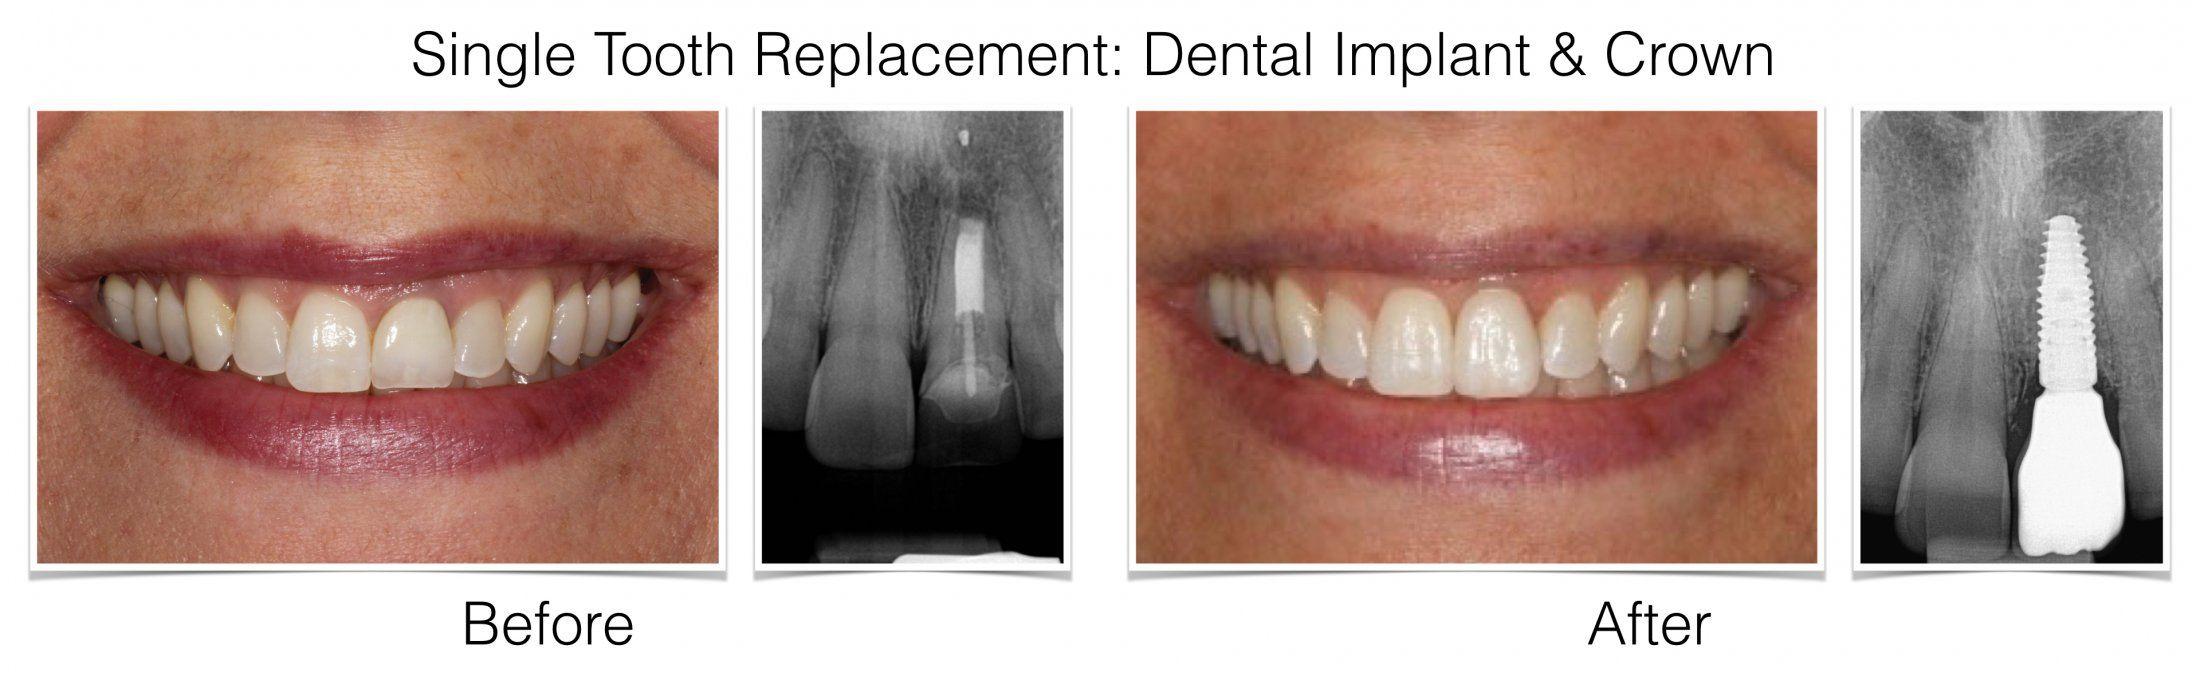 Esthetic Dental Implants Anterior Teeth Philadelphia Pa